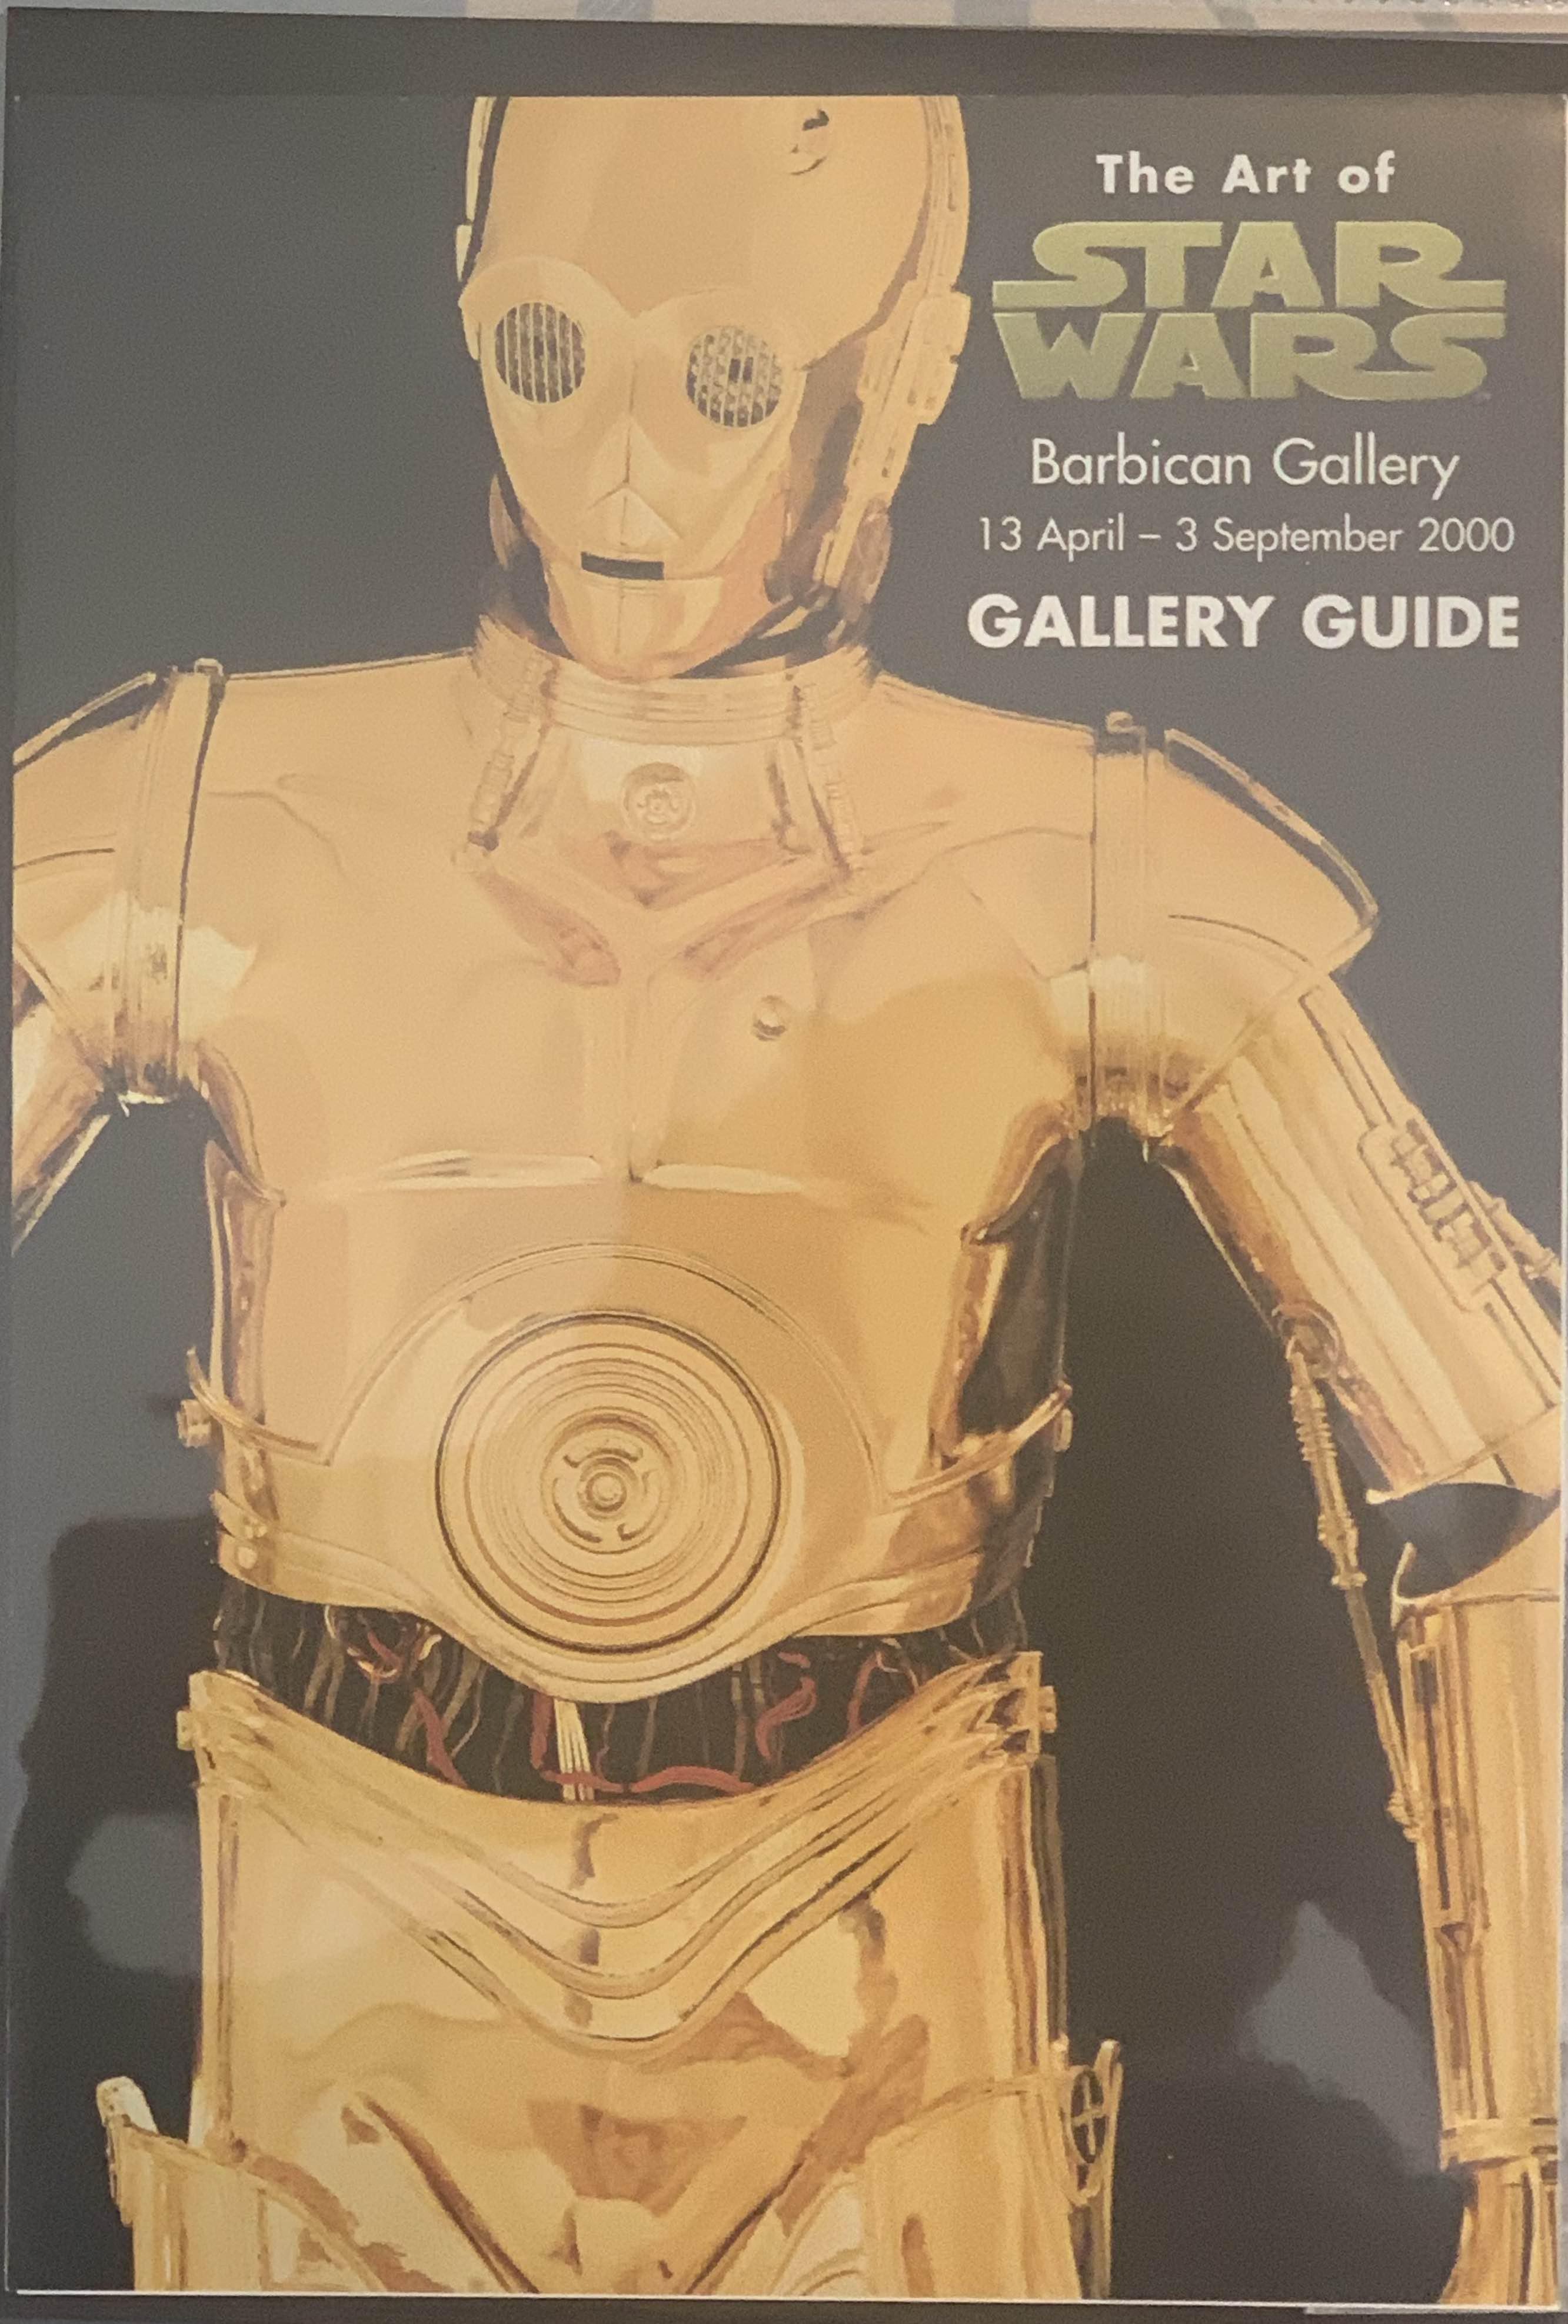 Barbican Art Gallery: The Art of Star Wars Materials